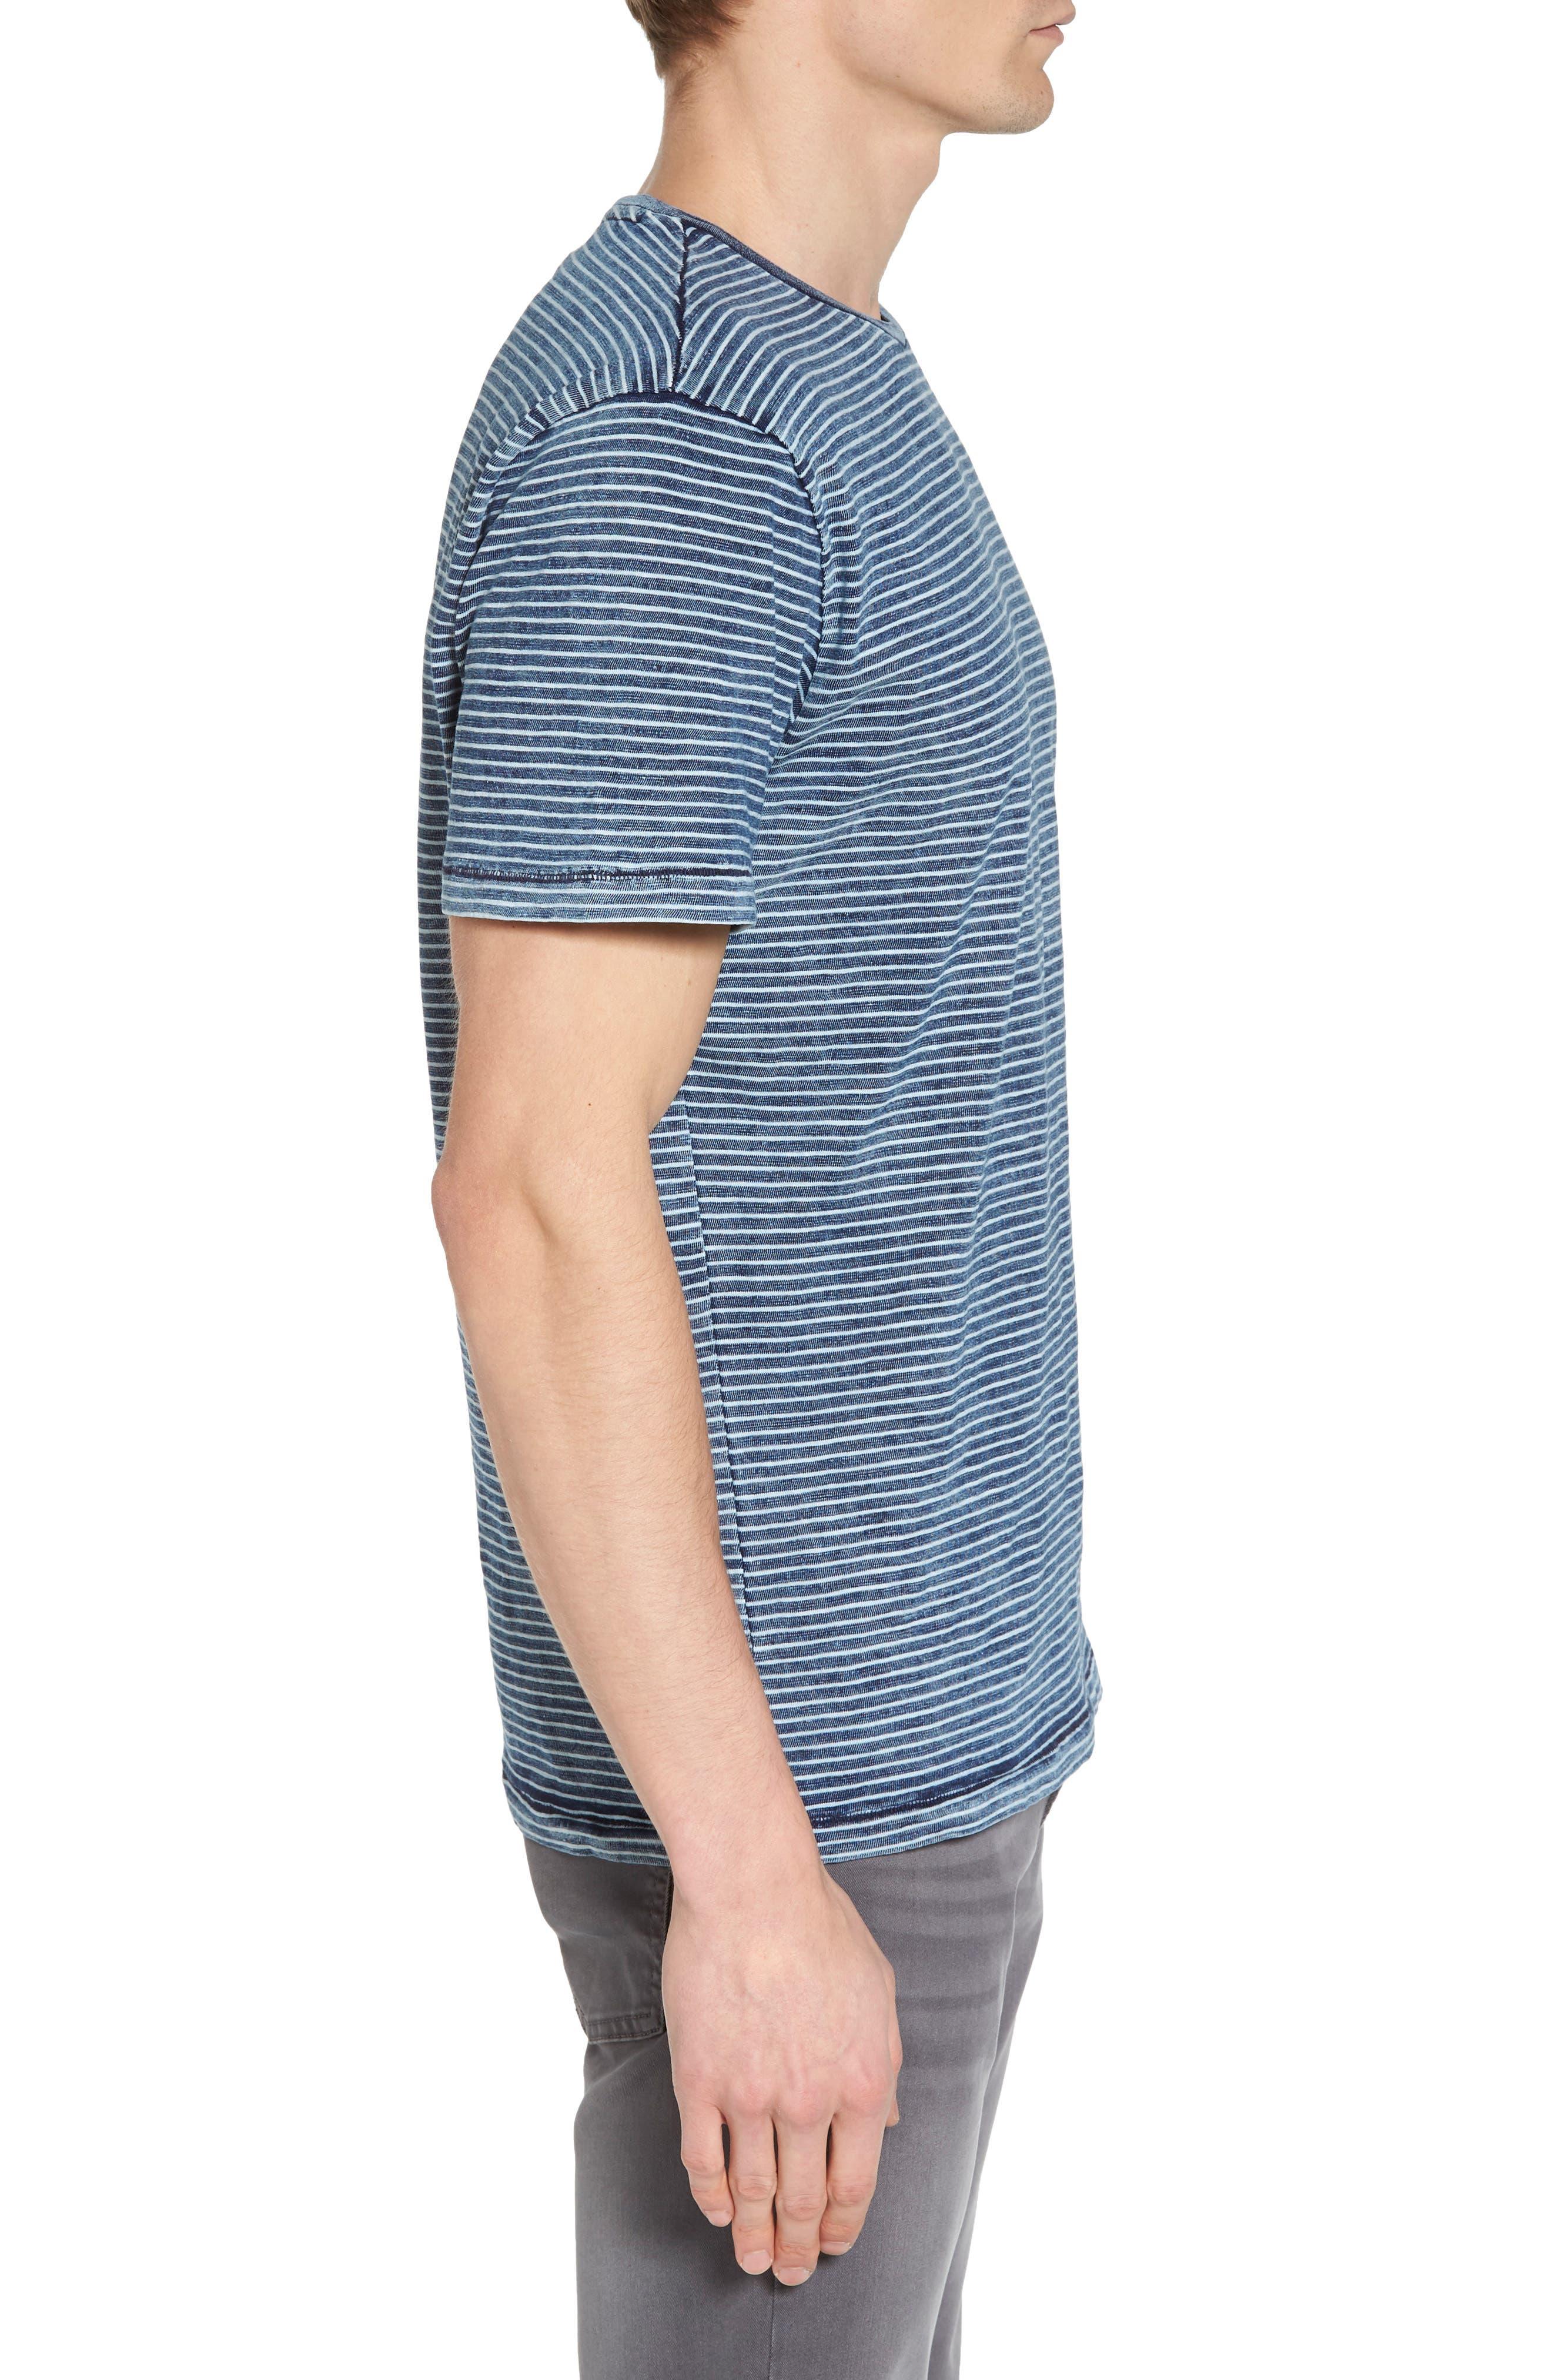 Julian Slim Fit Crewneck Shirt,                             Alternate thumbnail 9, color,